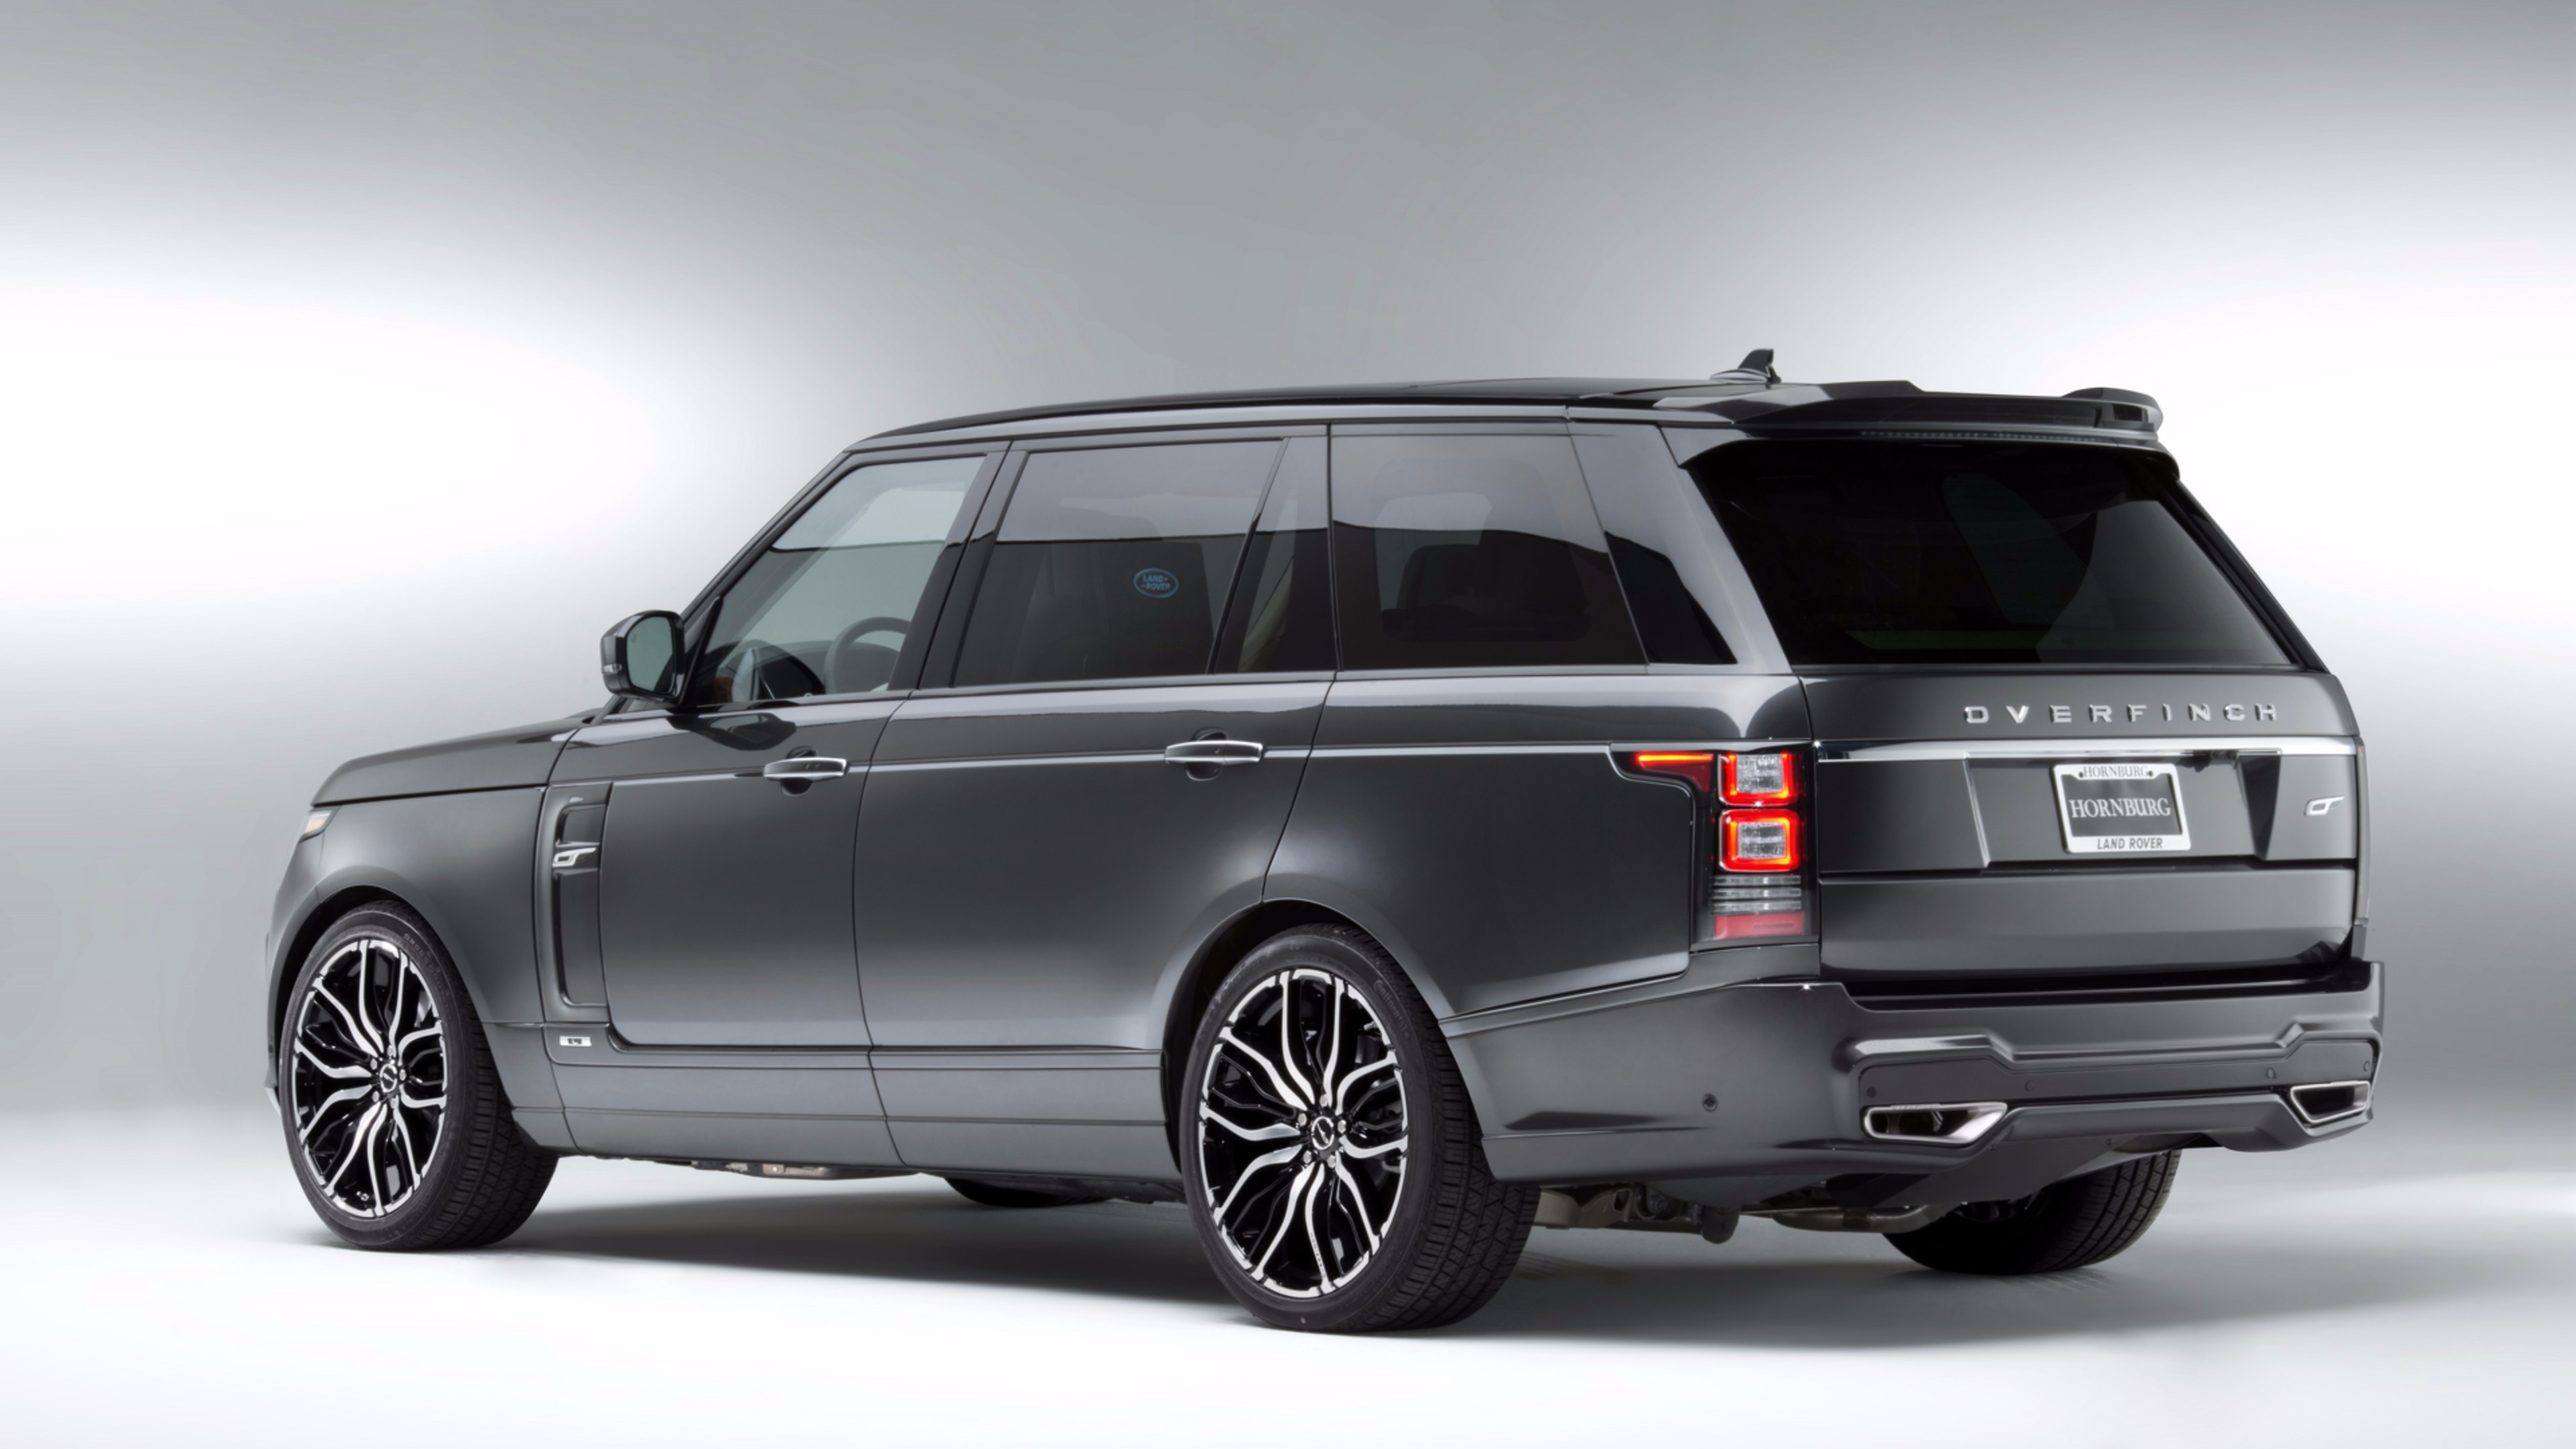 VWVortex Overfinch Manhattan and London Edition Range Rovers